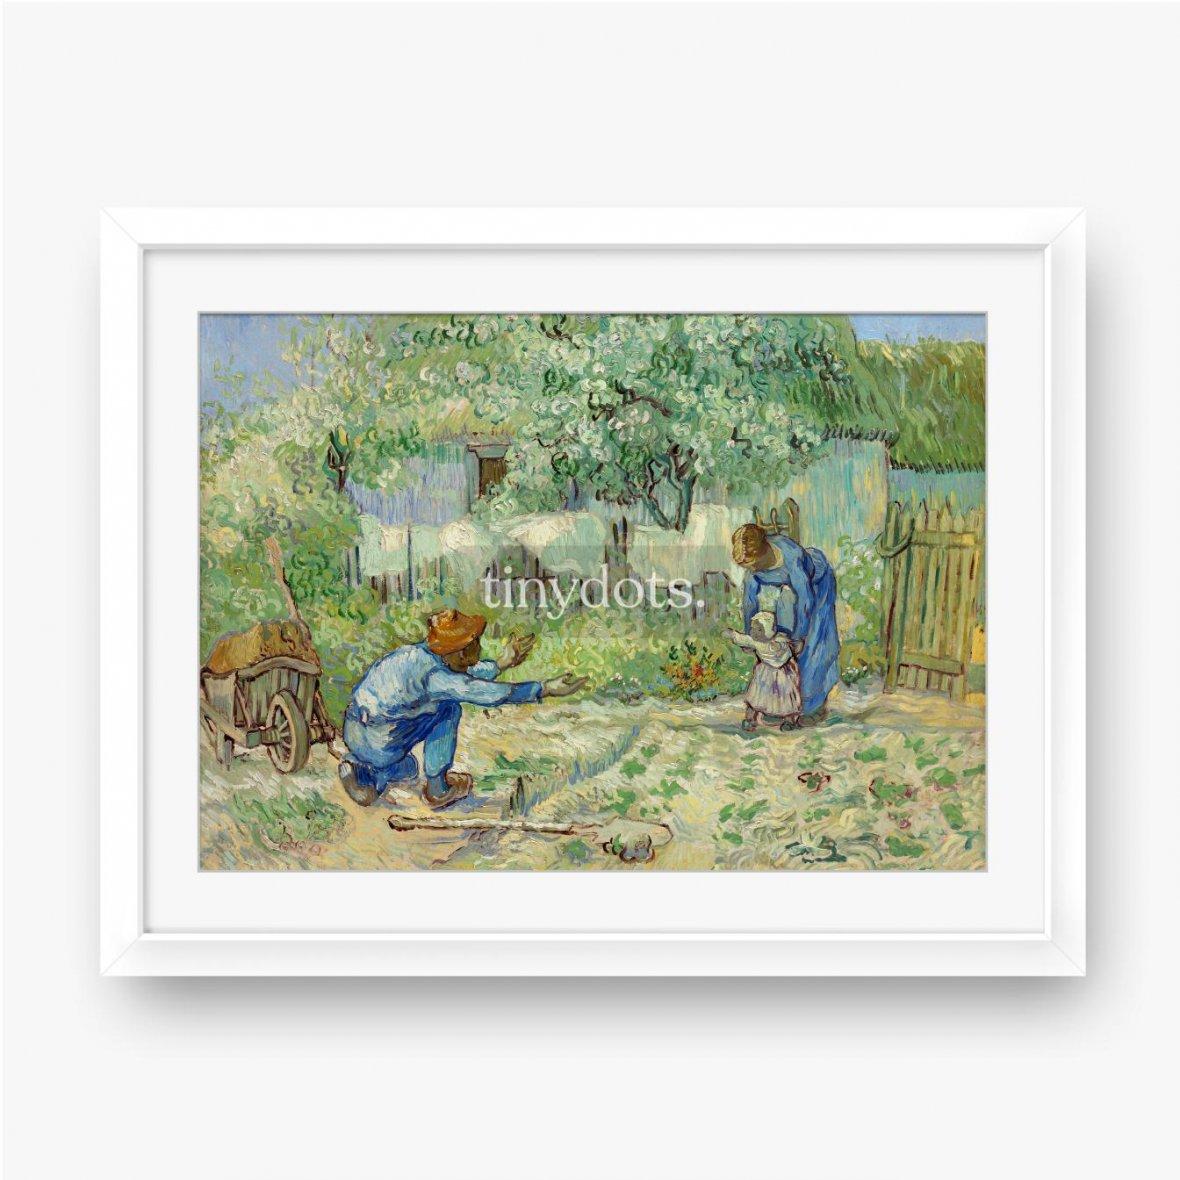 Gerahmtes Poster Vincent van Gogh, Erste Schritte nach Millet, 1890